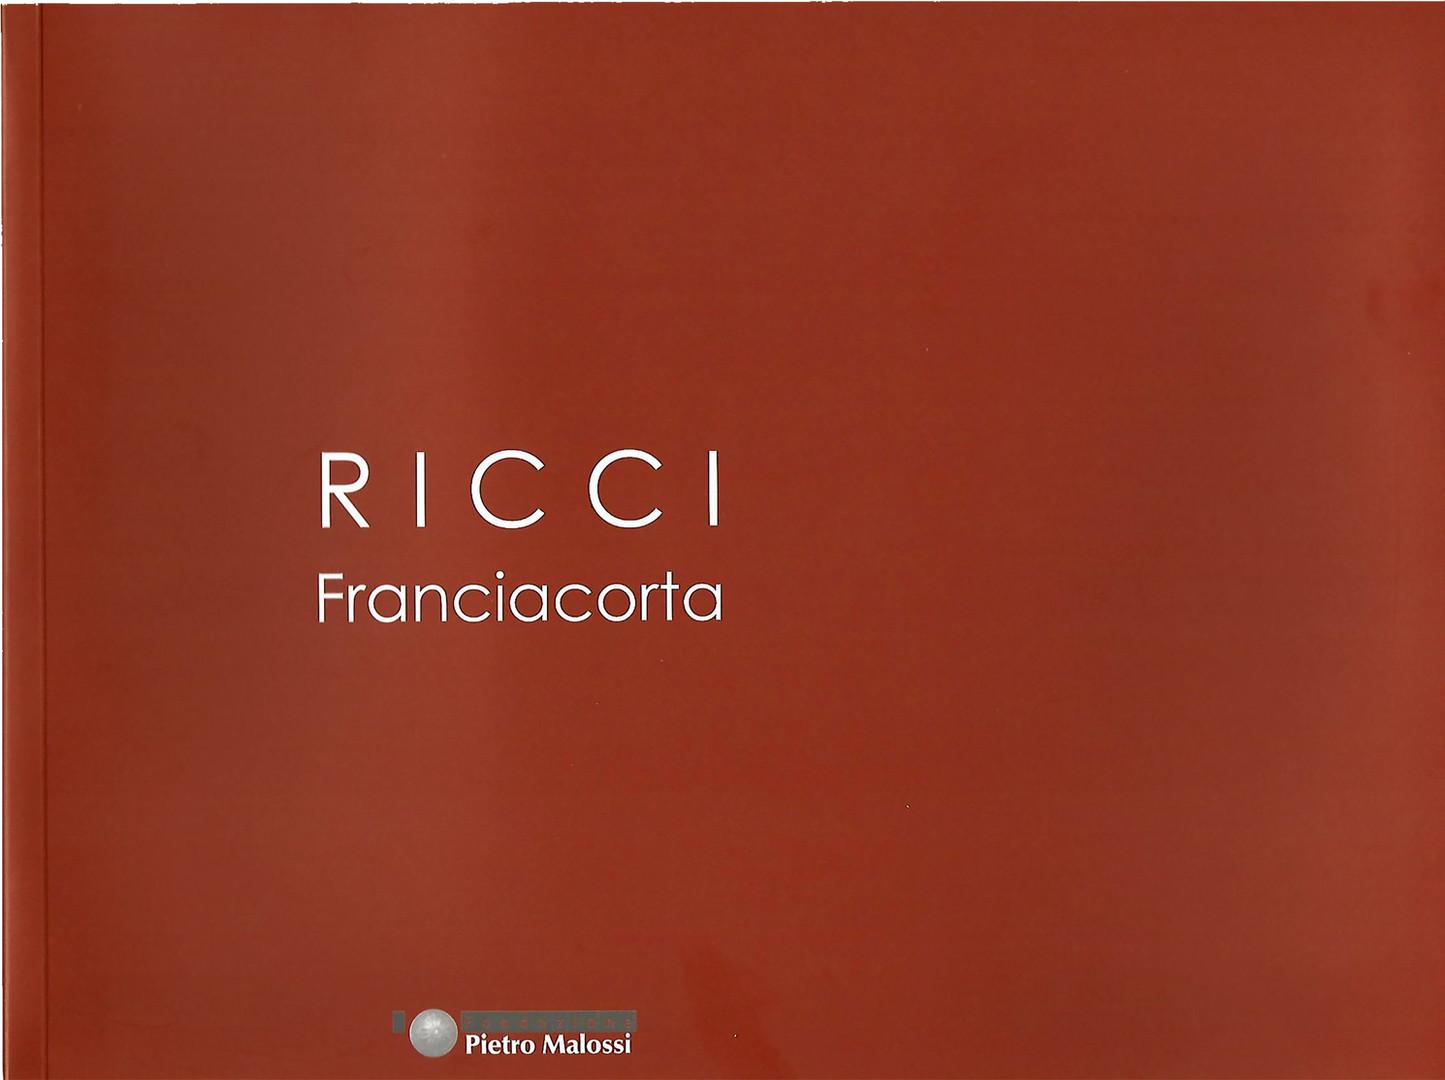 Ricci Franciacorta